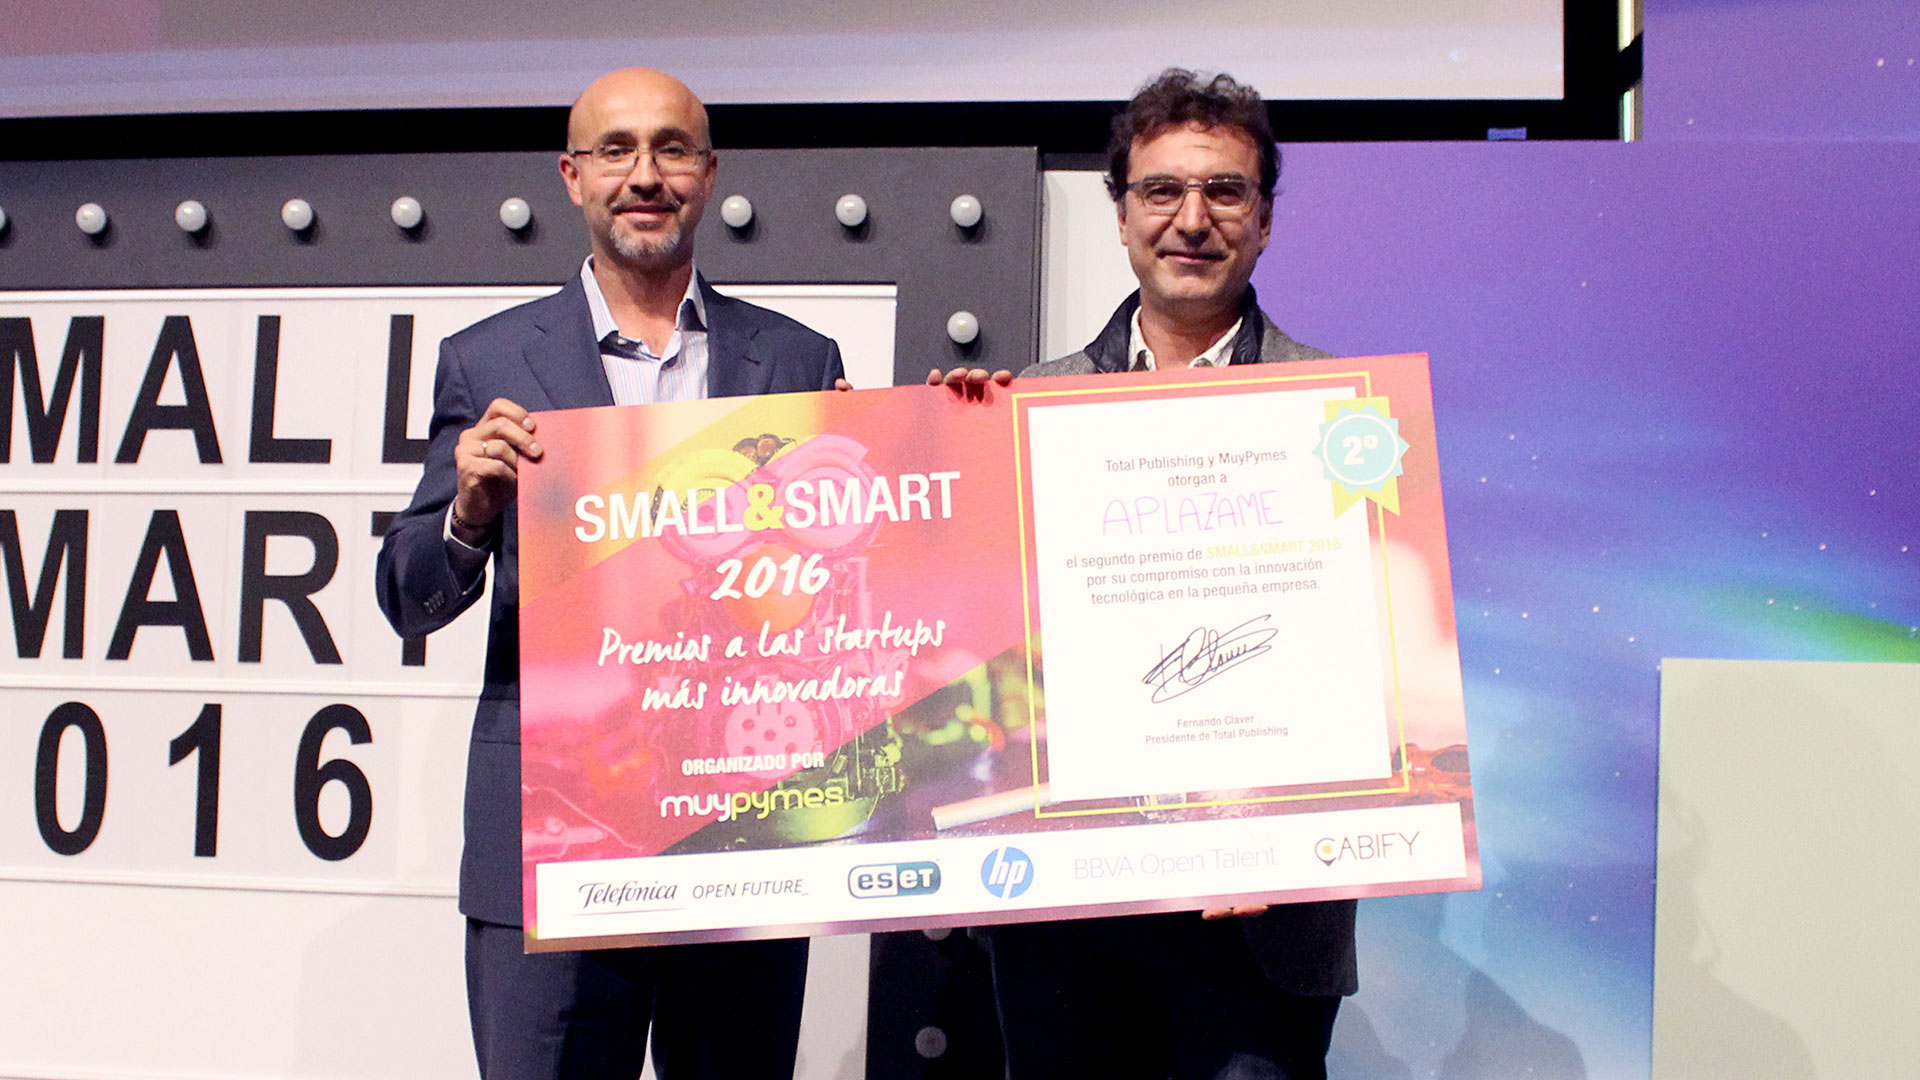 tpnet-small-smart-2016-evento-startups-segundo-premio-aplazame